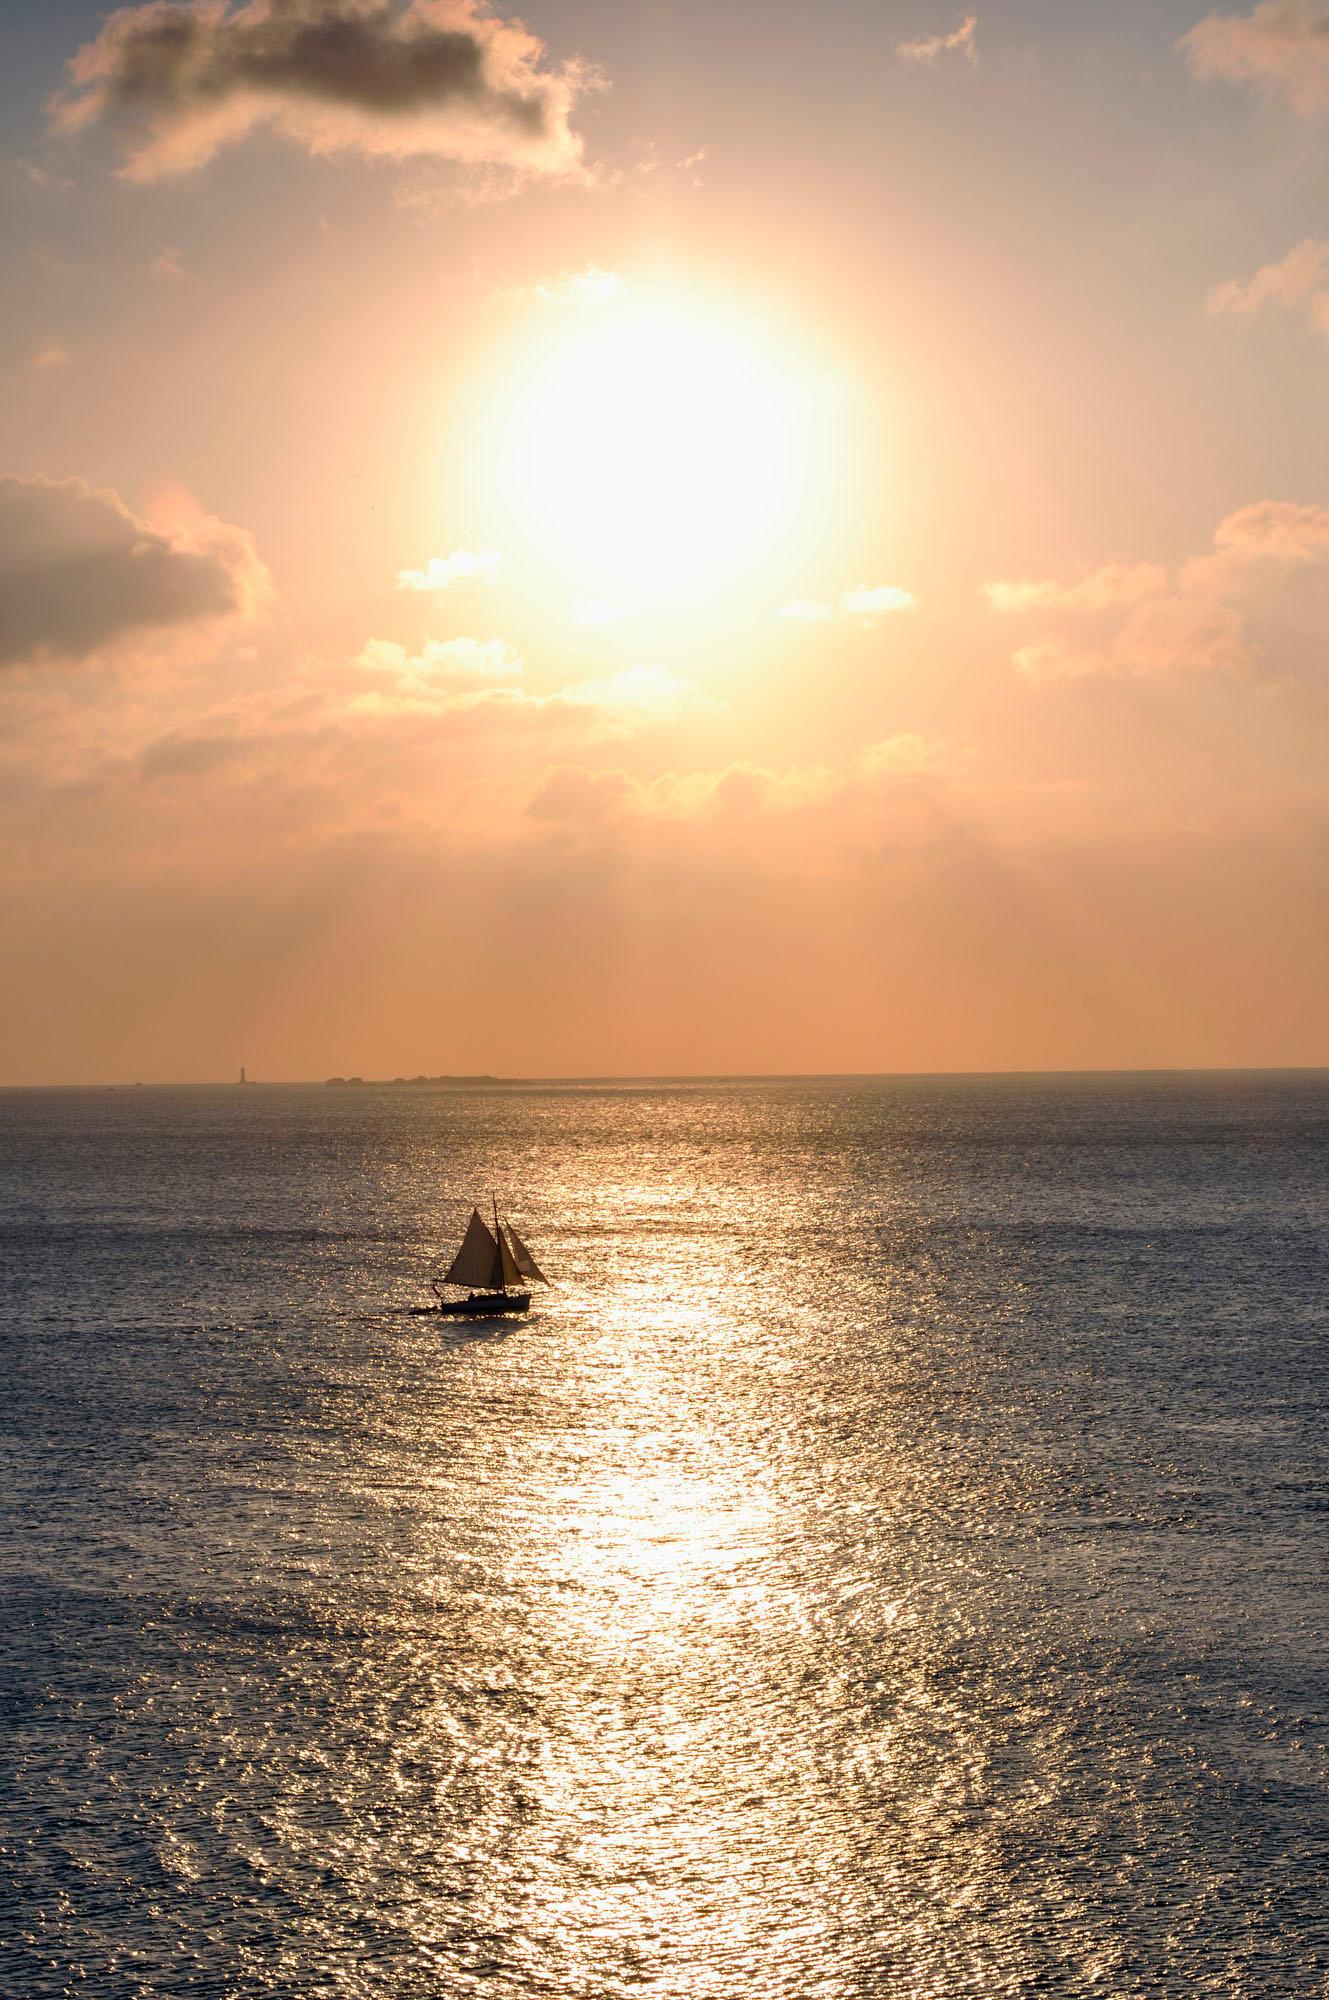 Mer d'Iroise, Finistère